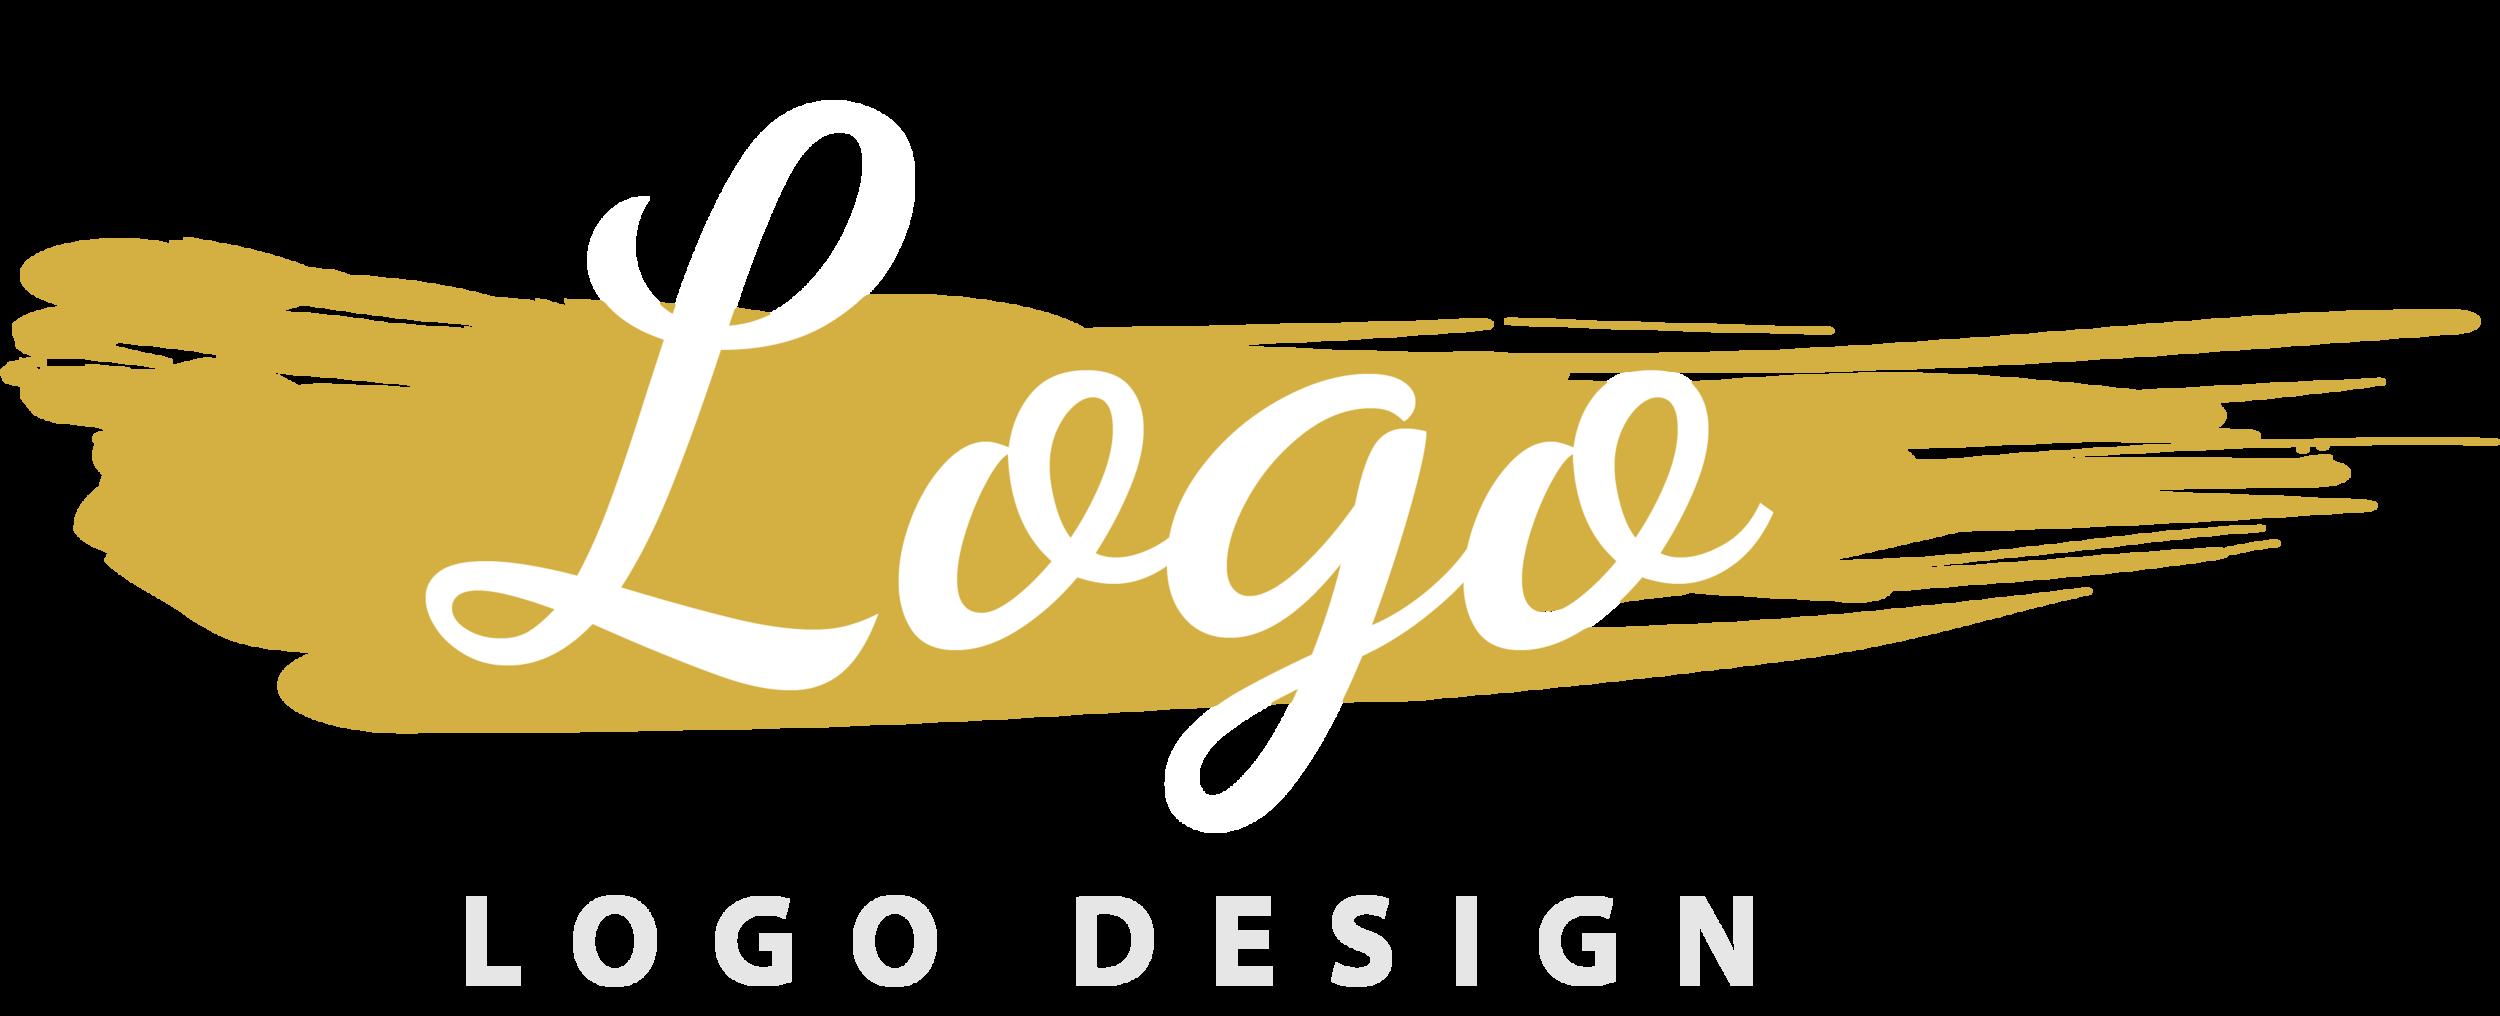 LogoDesign_SmallfryImage.png